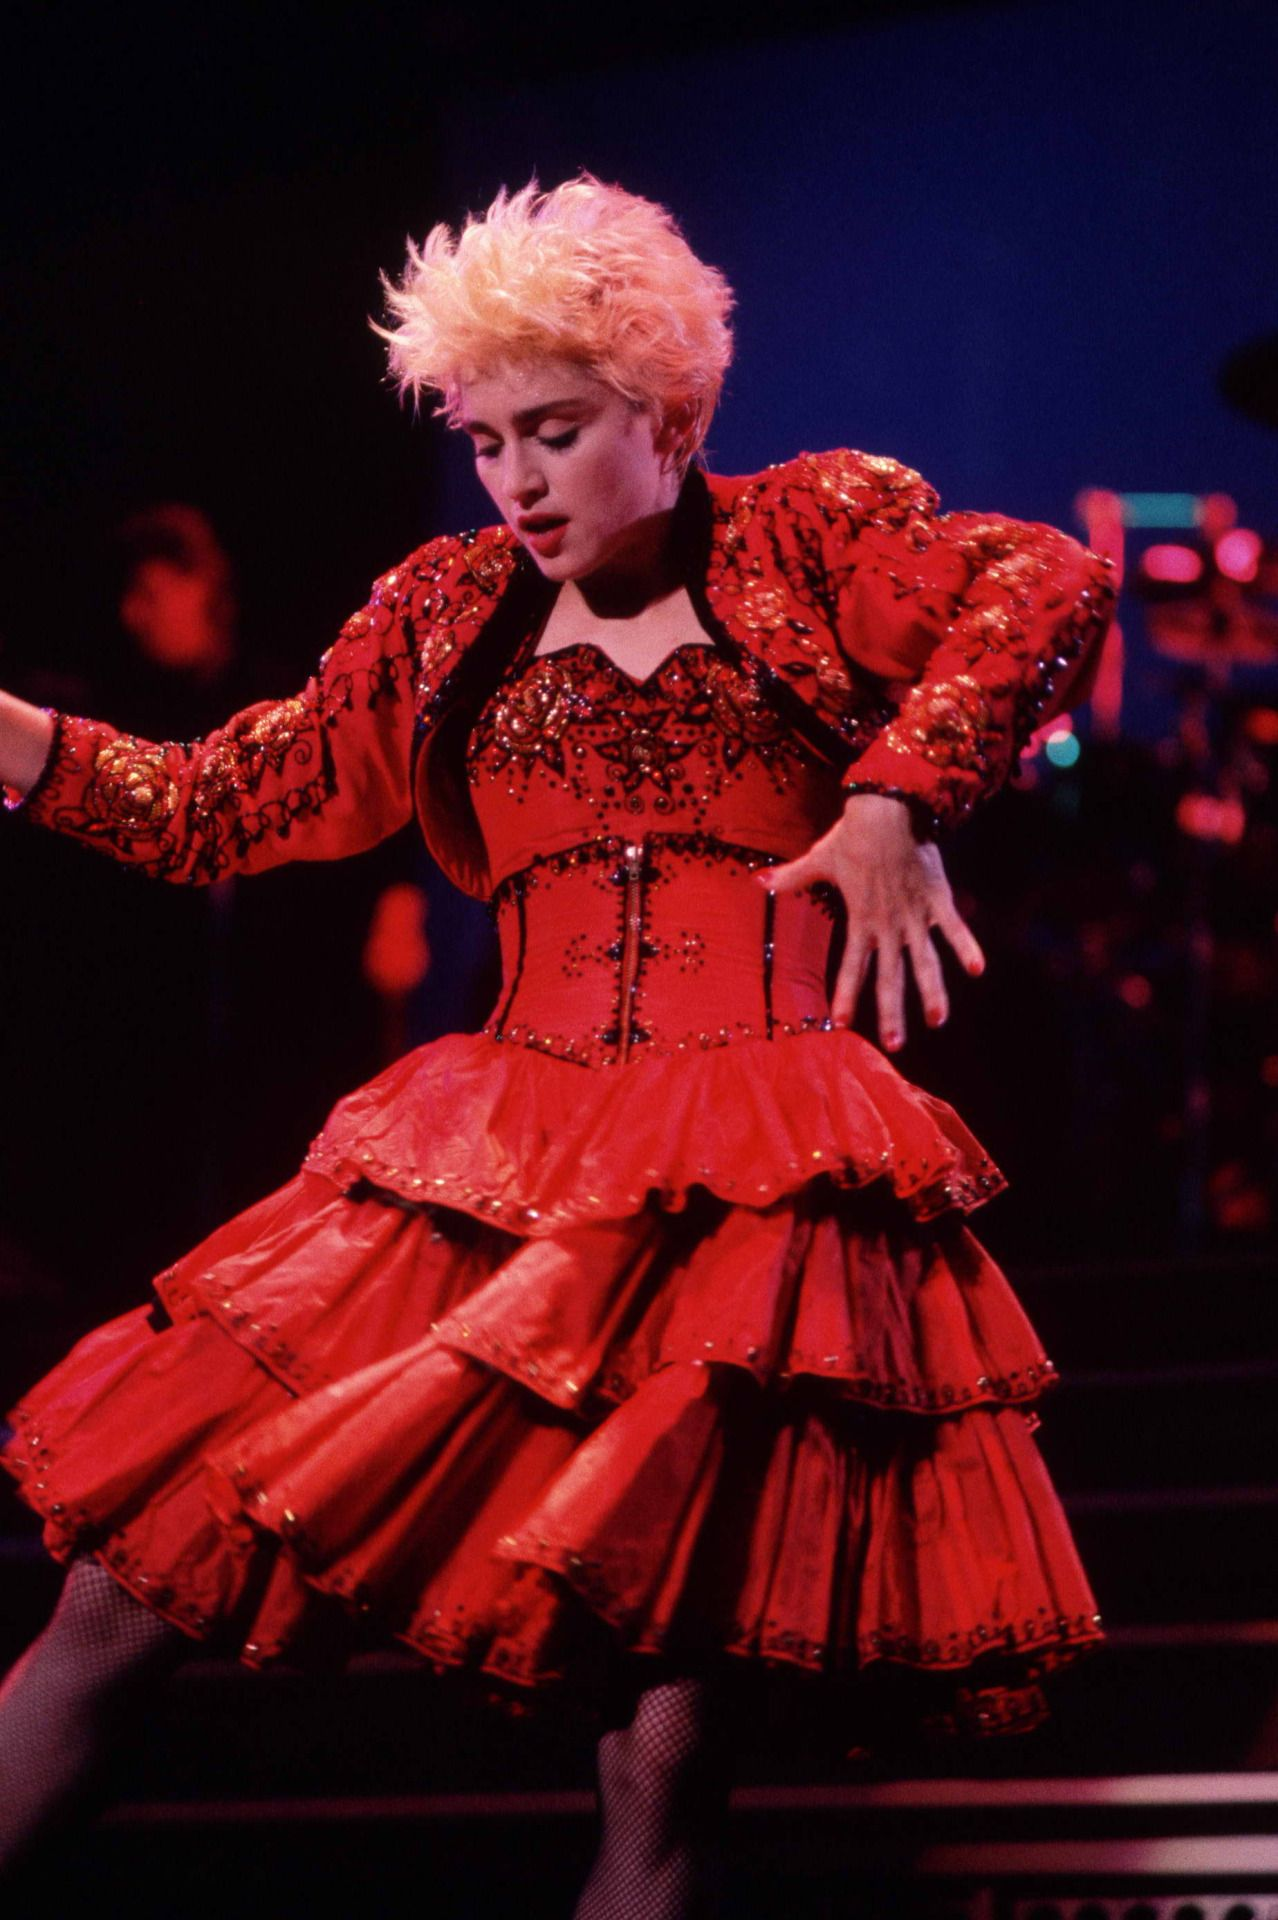 Madonna Ciccone Madonna, Best female artists, Madonna 80s